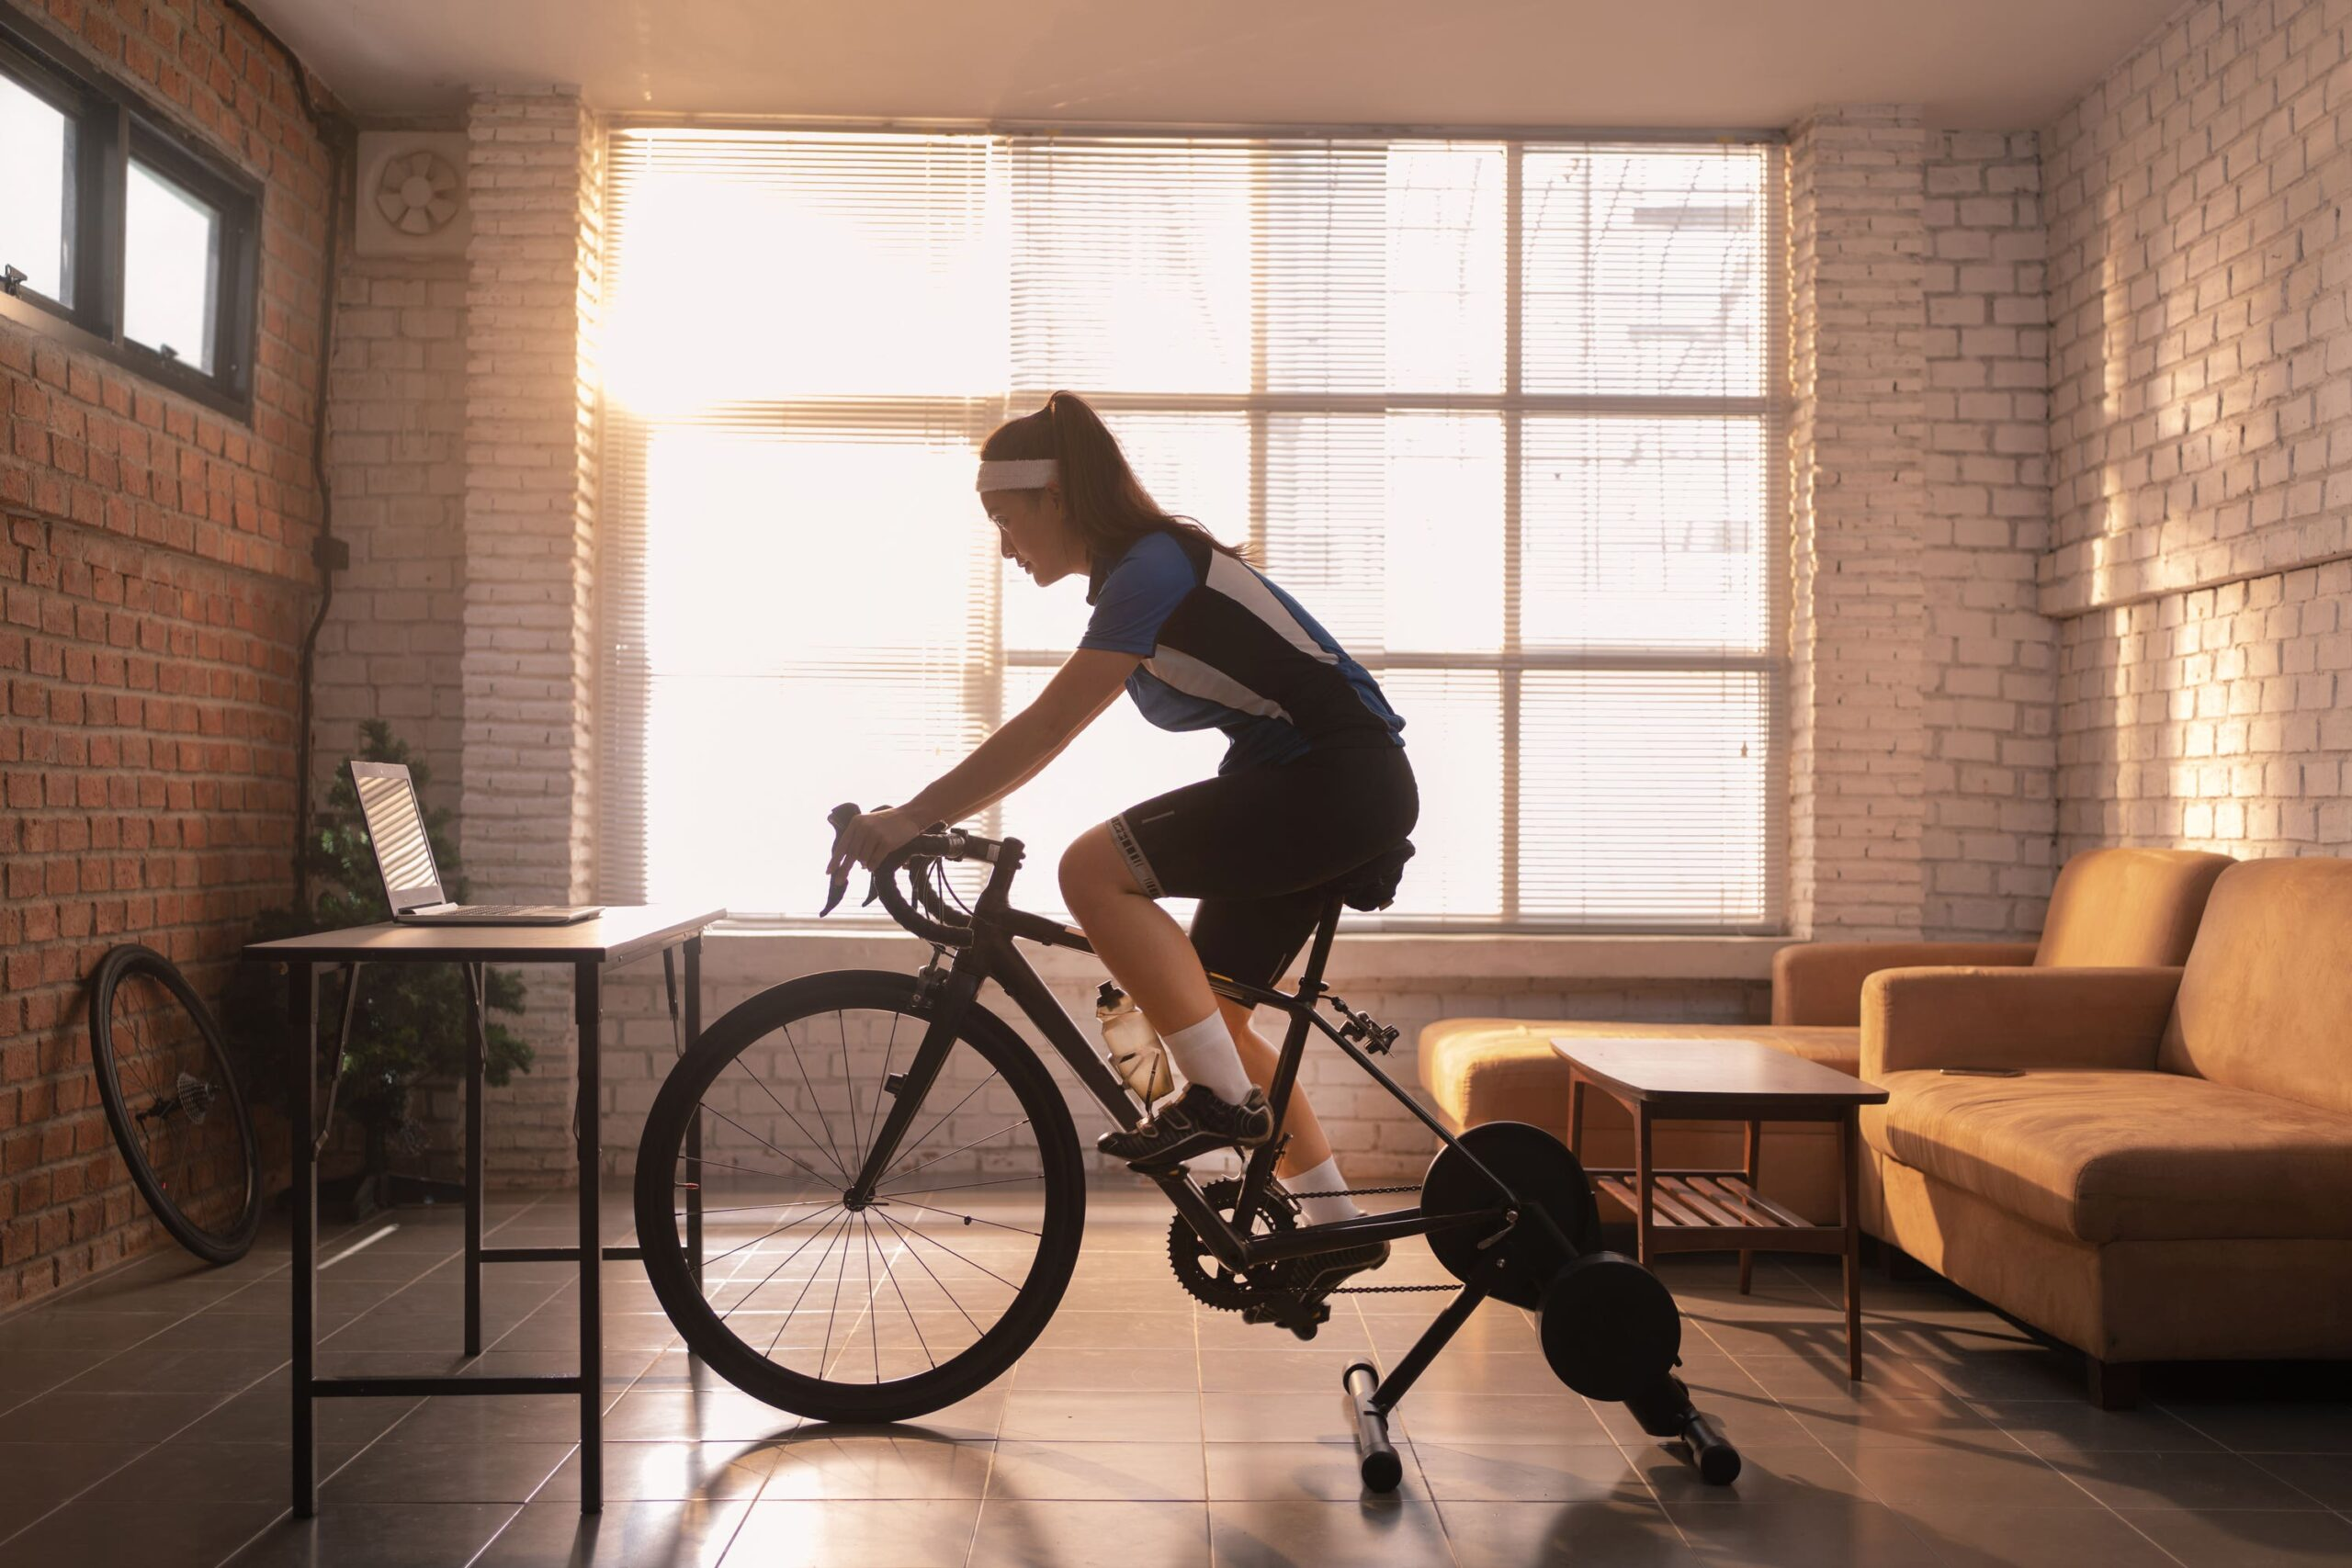 home exercise bike scaled